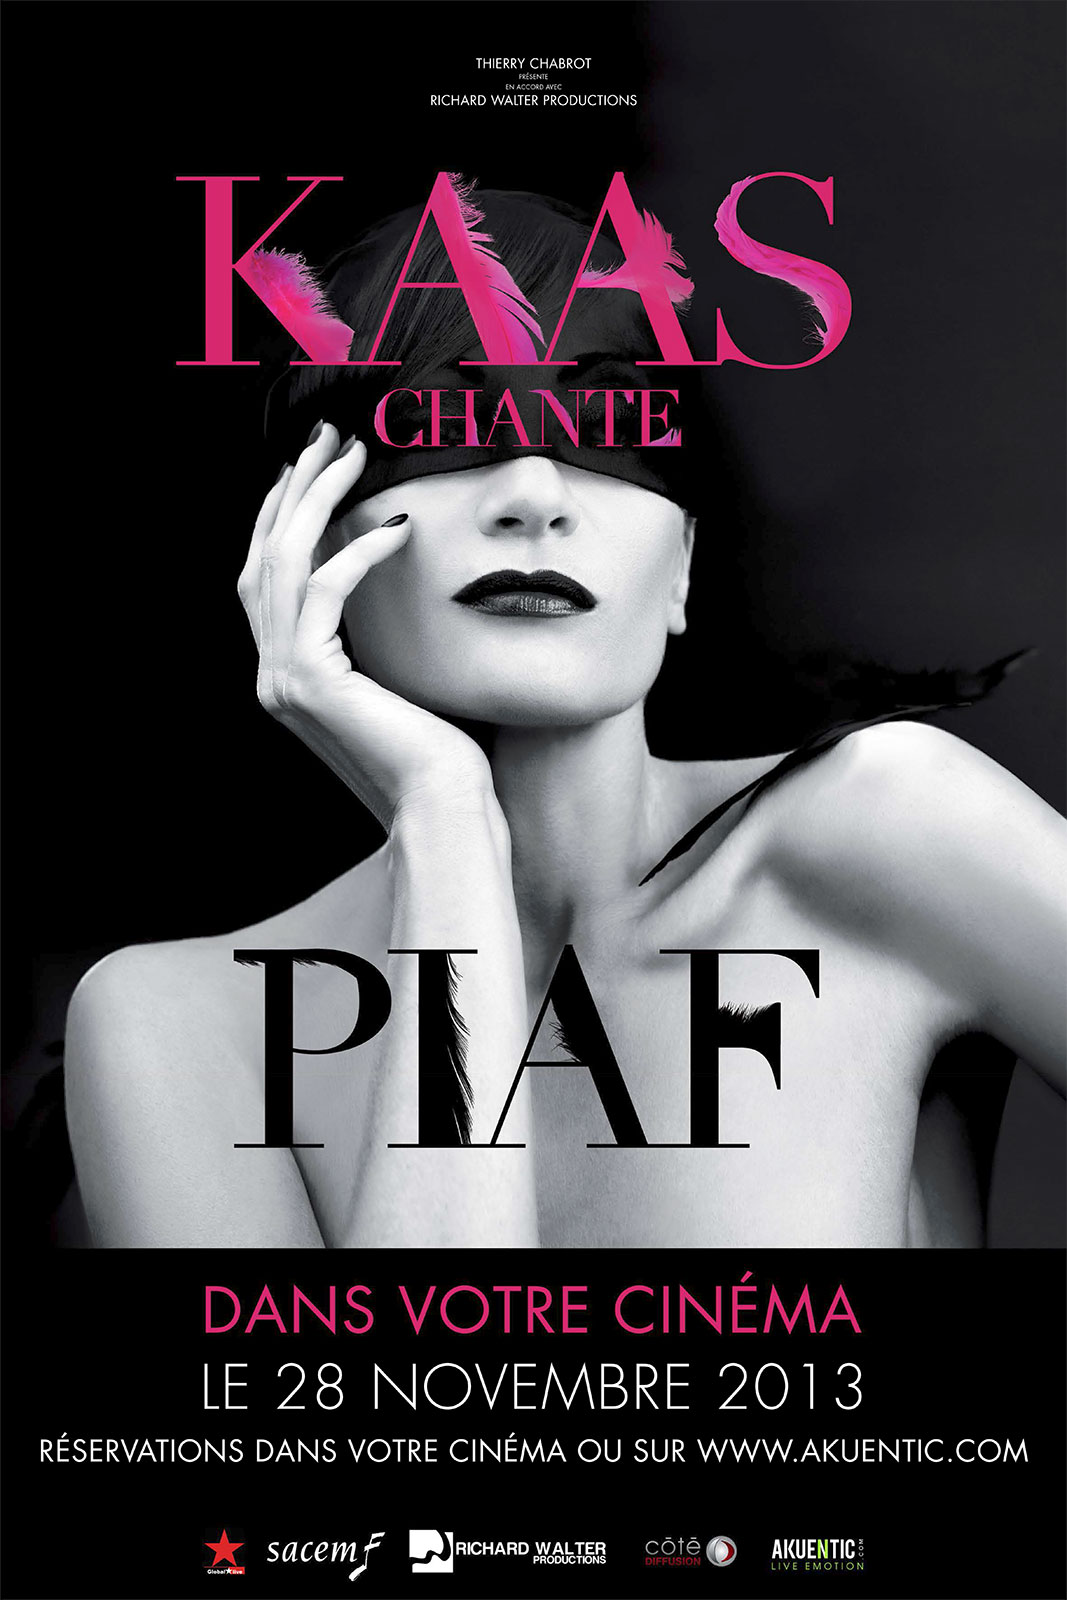 Télécharger Patricia Kaas chante Piaf VF TUREFRENCH Uptobox